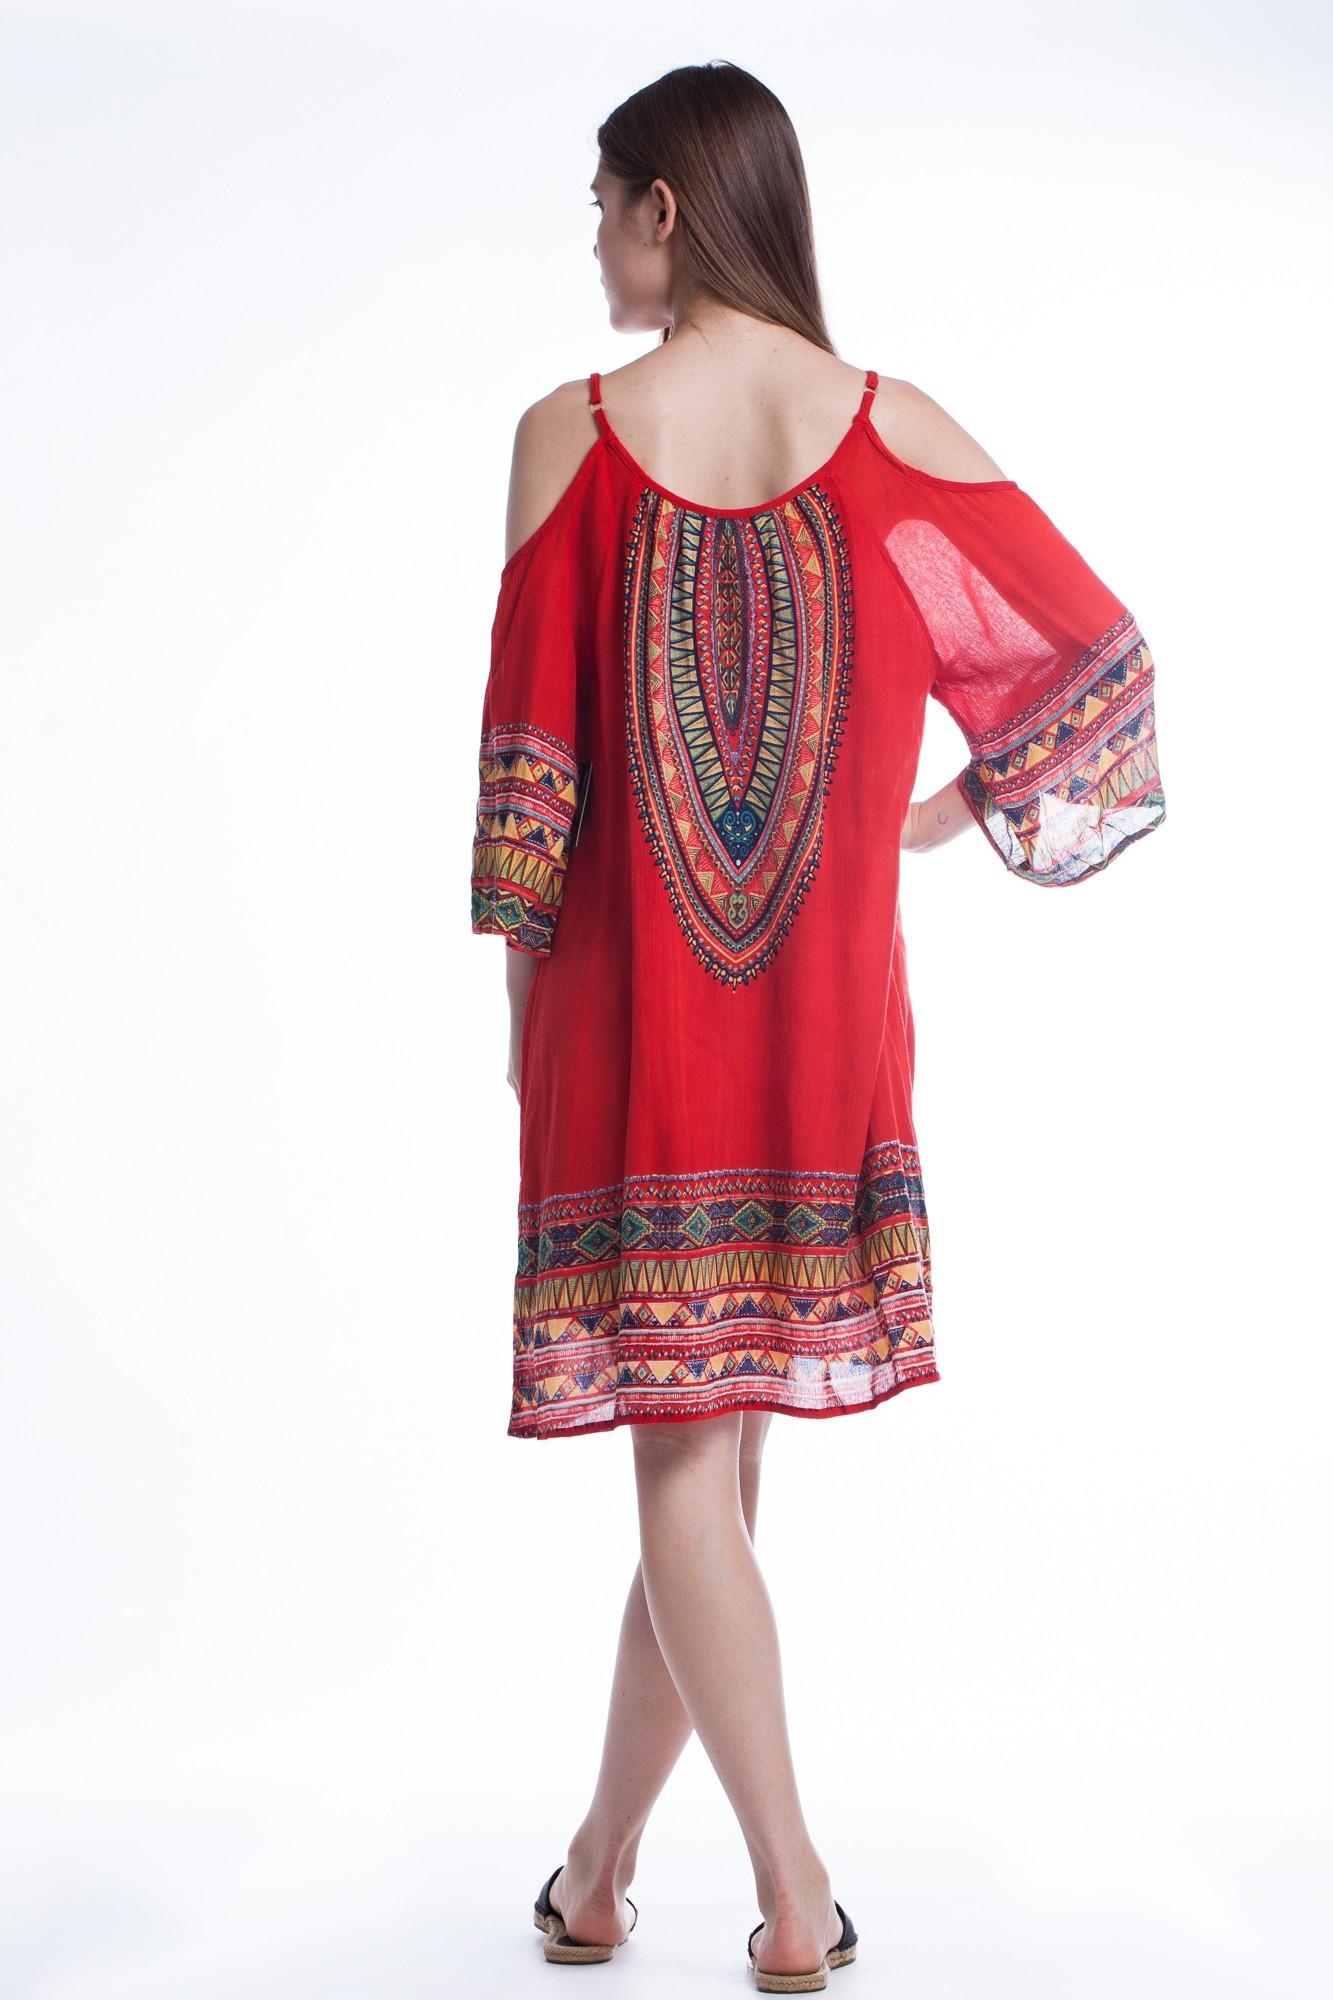 Rochie rosie cu umerii decupati bretele reglabile si imprimeu etnic